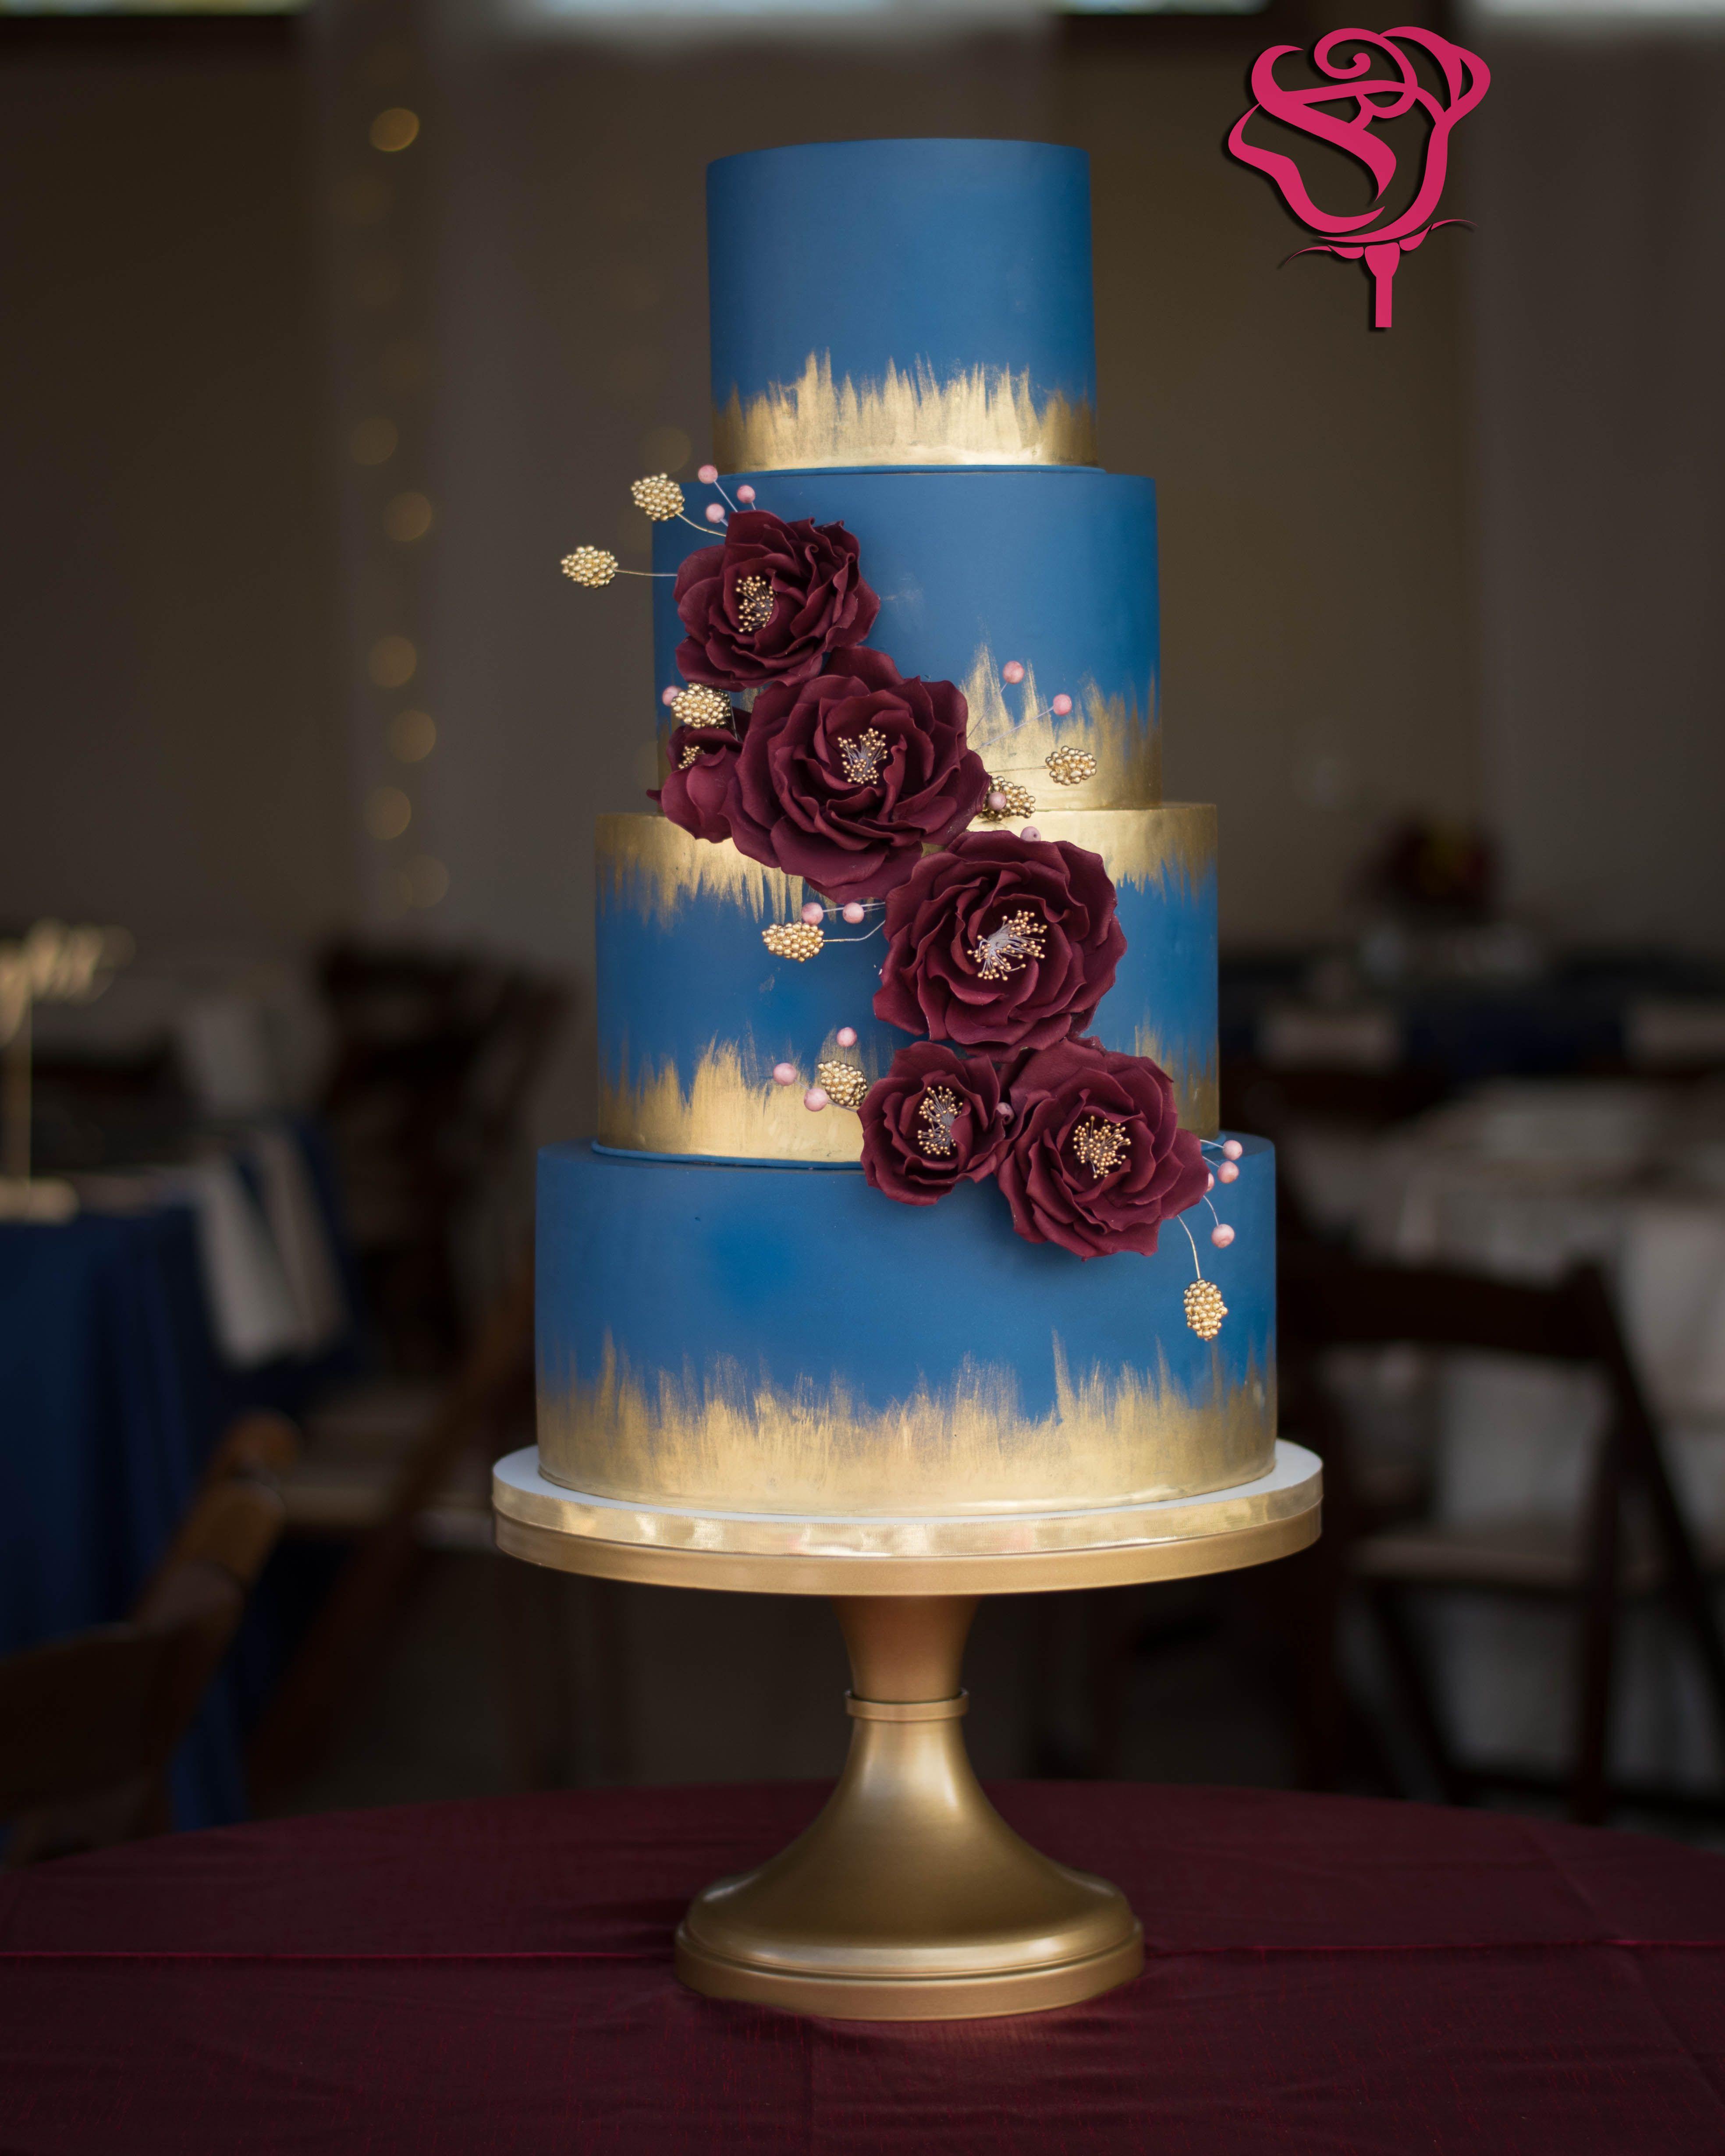 Navy Blue And Burgundy Wine Wedding Cake With Gold Details Wine Wedding Cake Burgundy Wedding Cake Fall Wedding Cakes